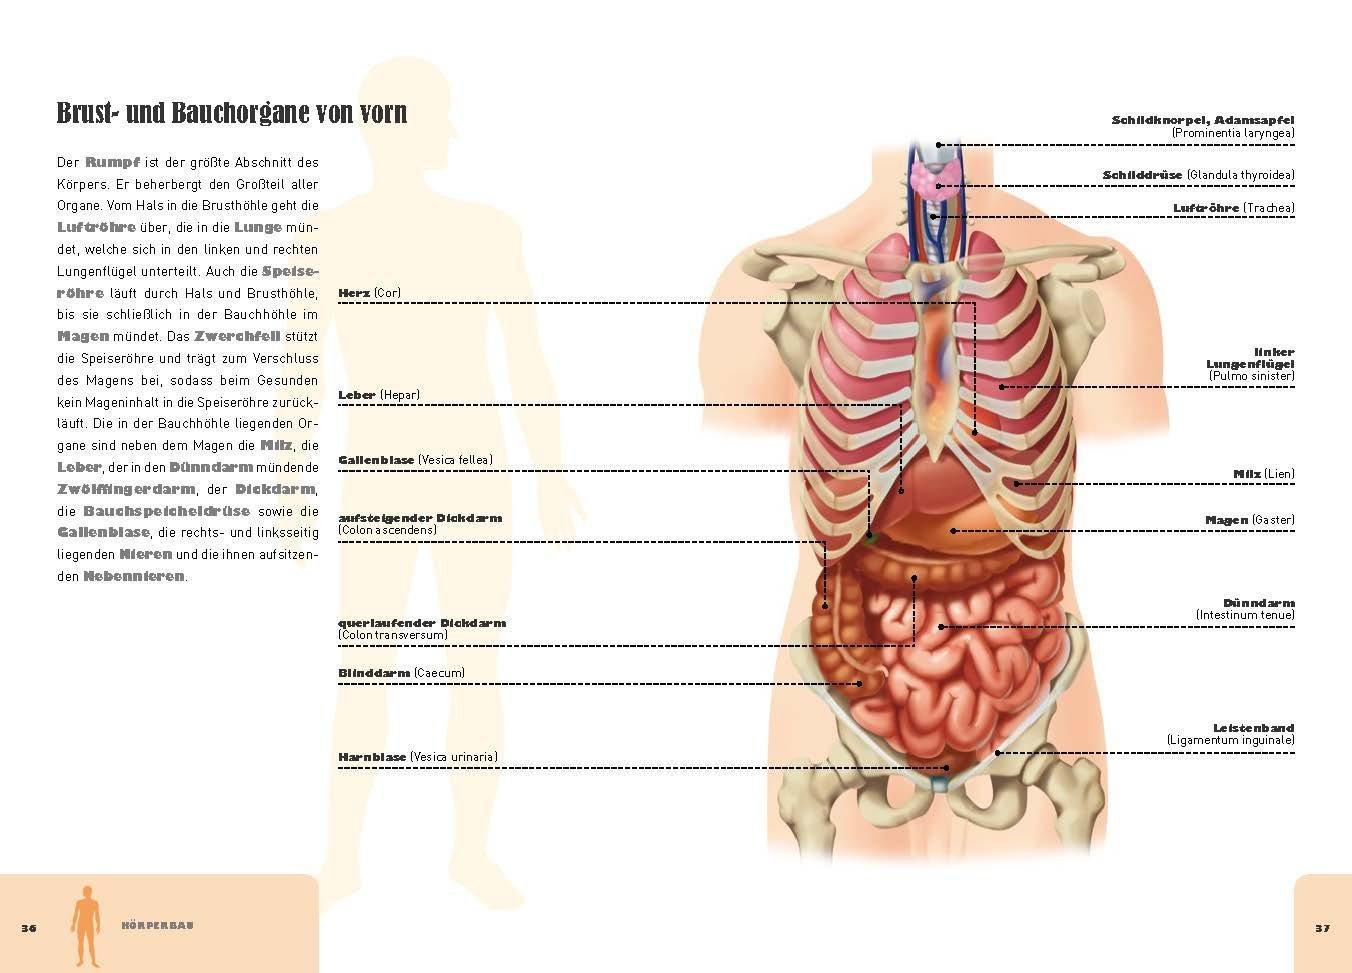 KöRper Anatomie Organe RL91 | Messianica